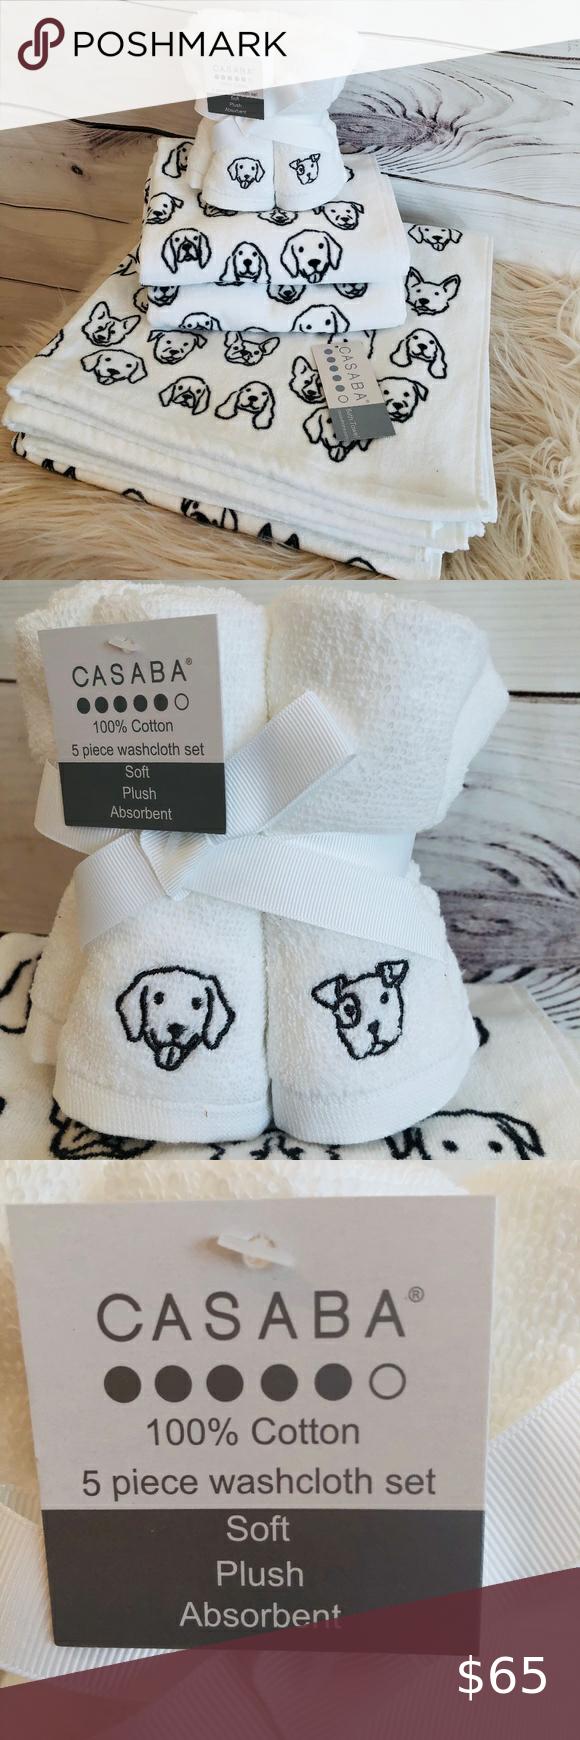 Casaba Nwt 9 Piece Bath Towel Set Cute Dogs Towel Set Bath Towel Sets Black And White Dog